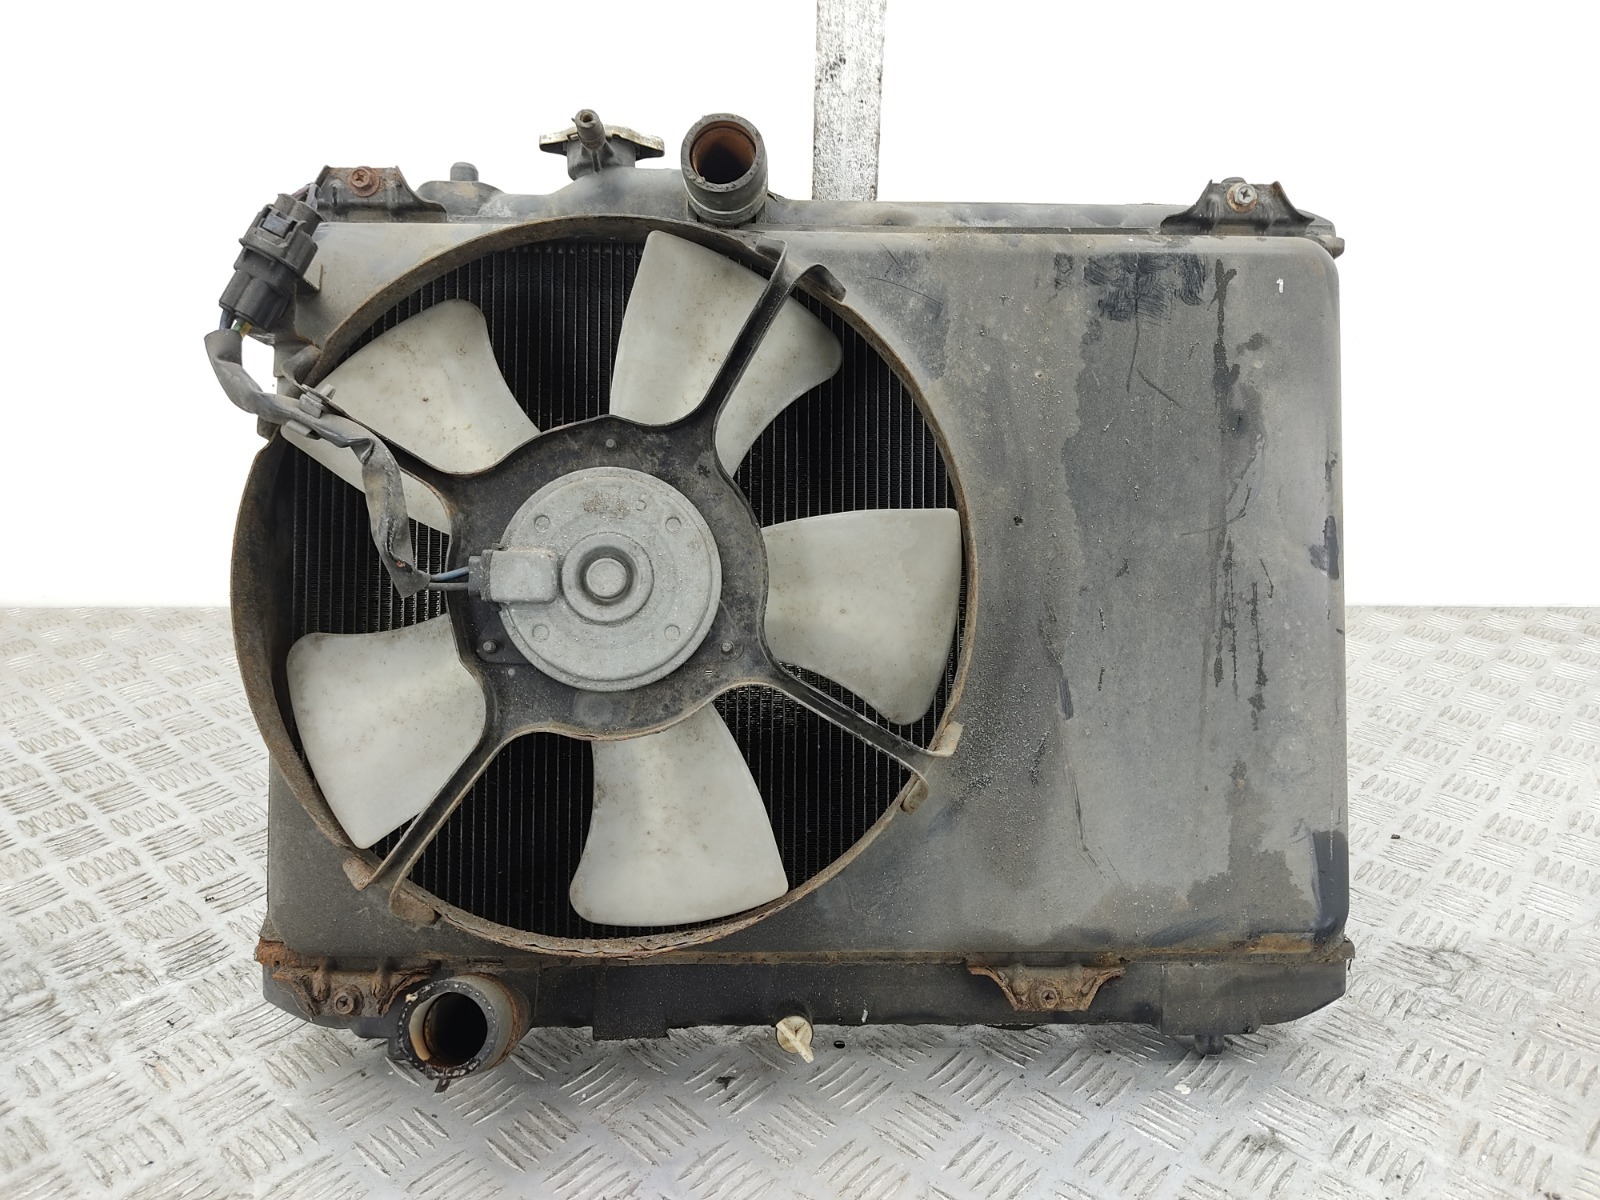 Кассета радиаторов Suzuki Swift 1.5 I 2005 (б/у)